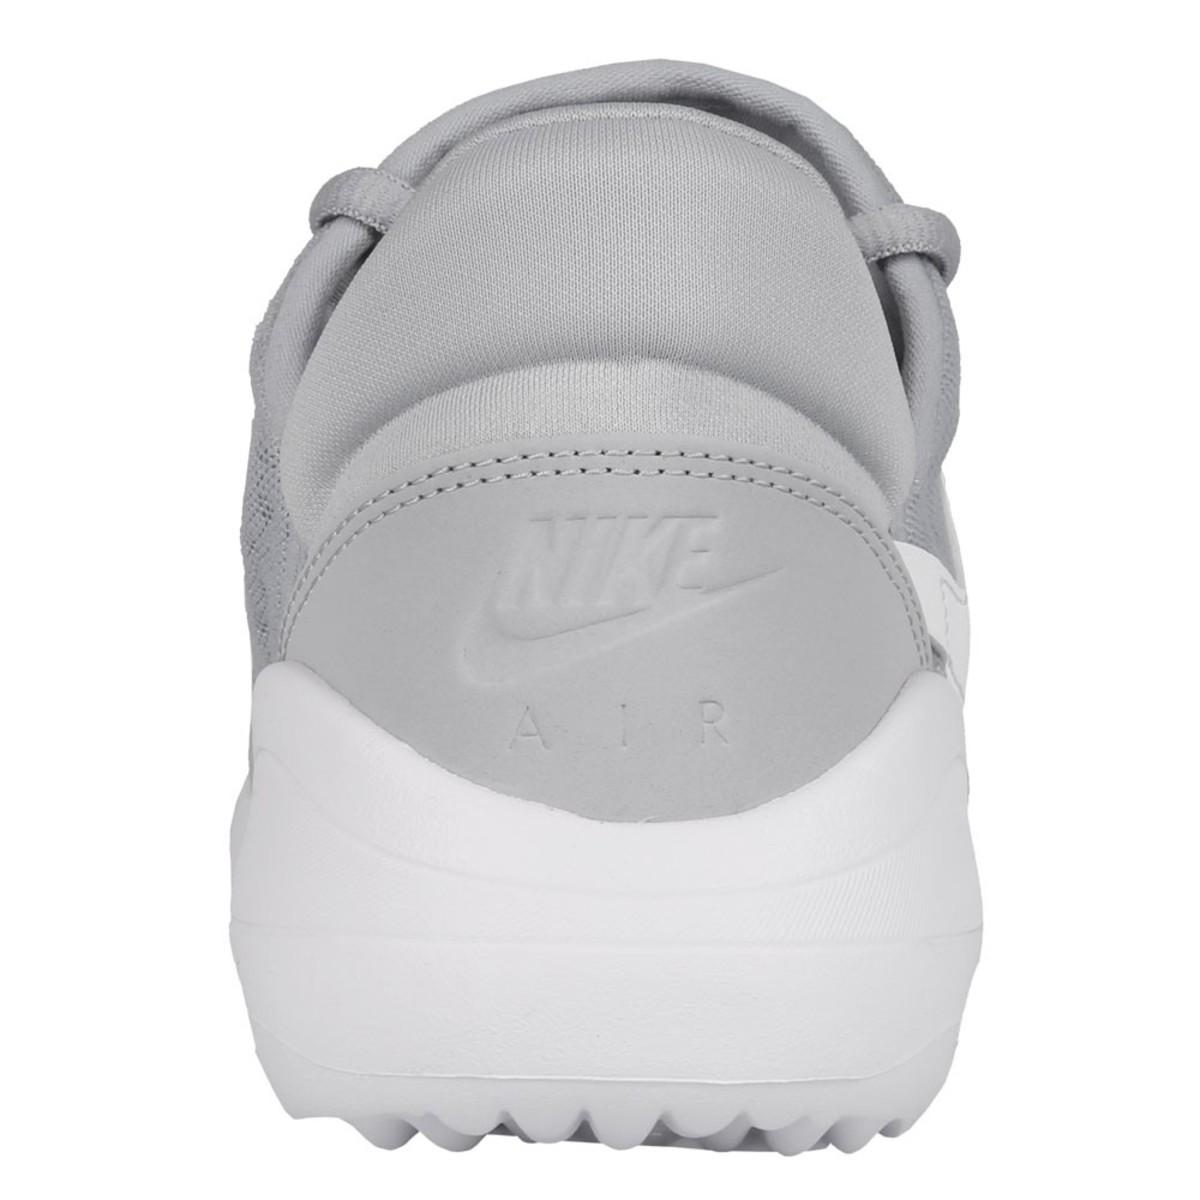 Bild 3 von Nike Air Max Sasha (Damen), Sneaker, schwarz 35,5